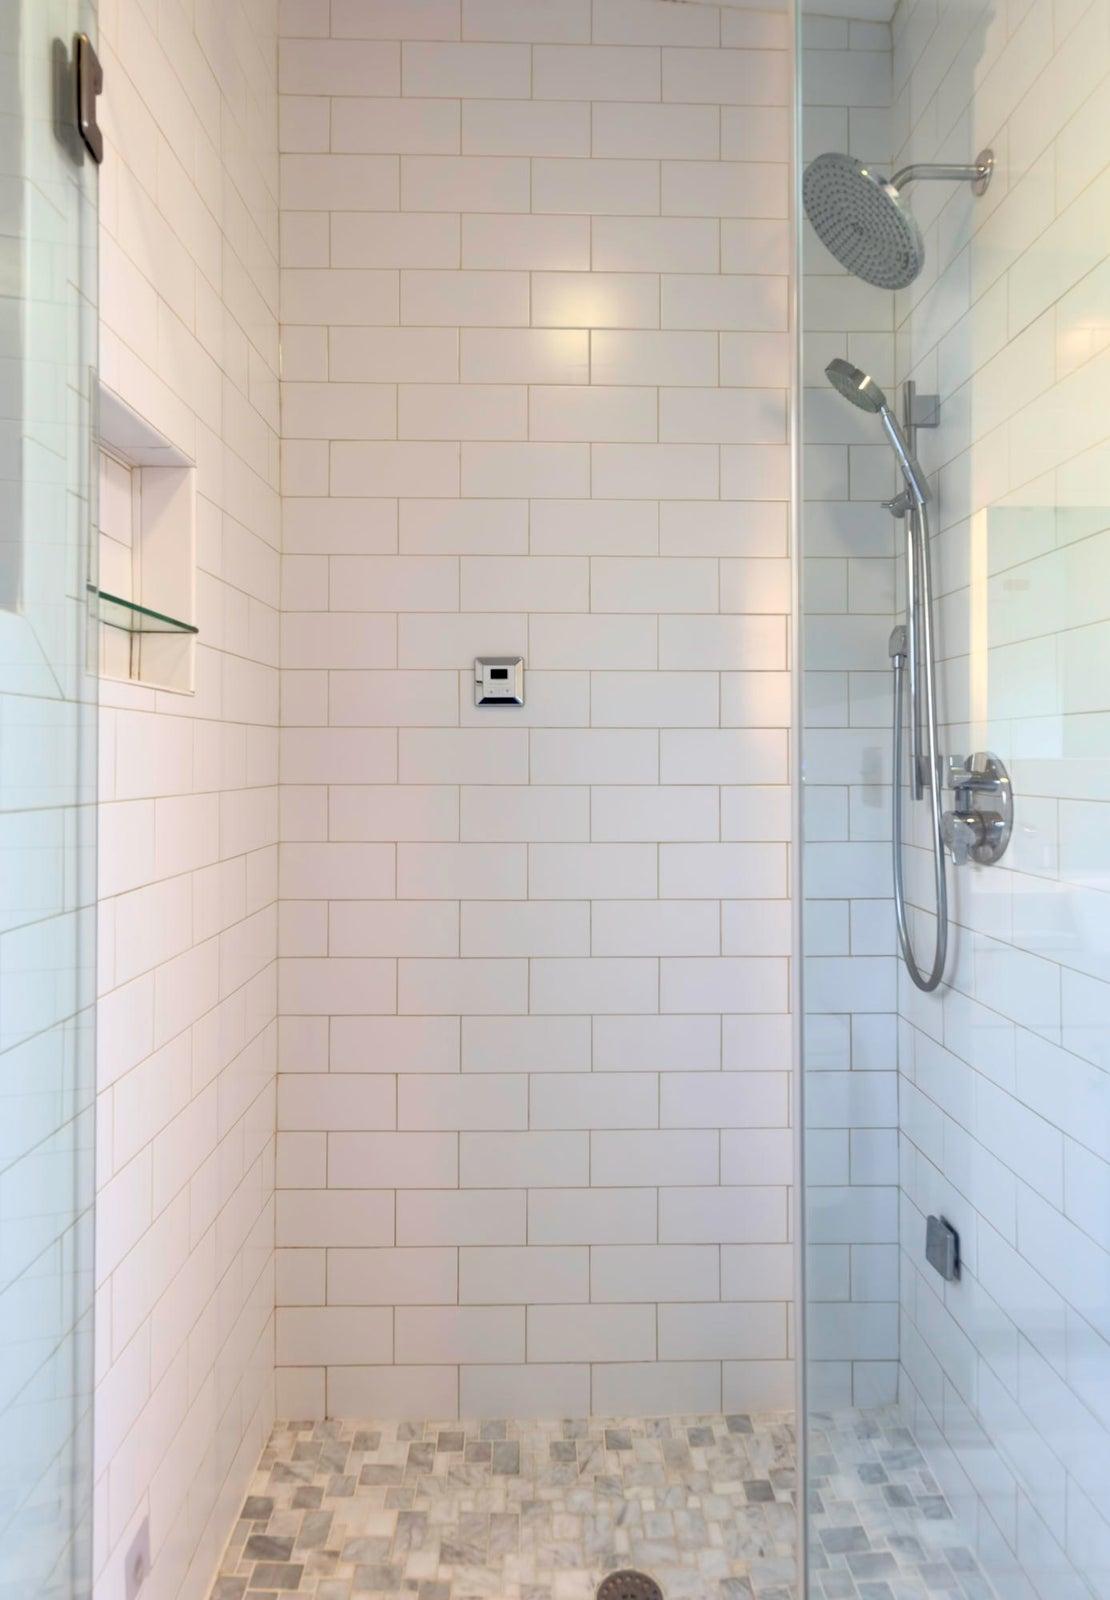 DSC_2049-HDR - MB Steam Shower